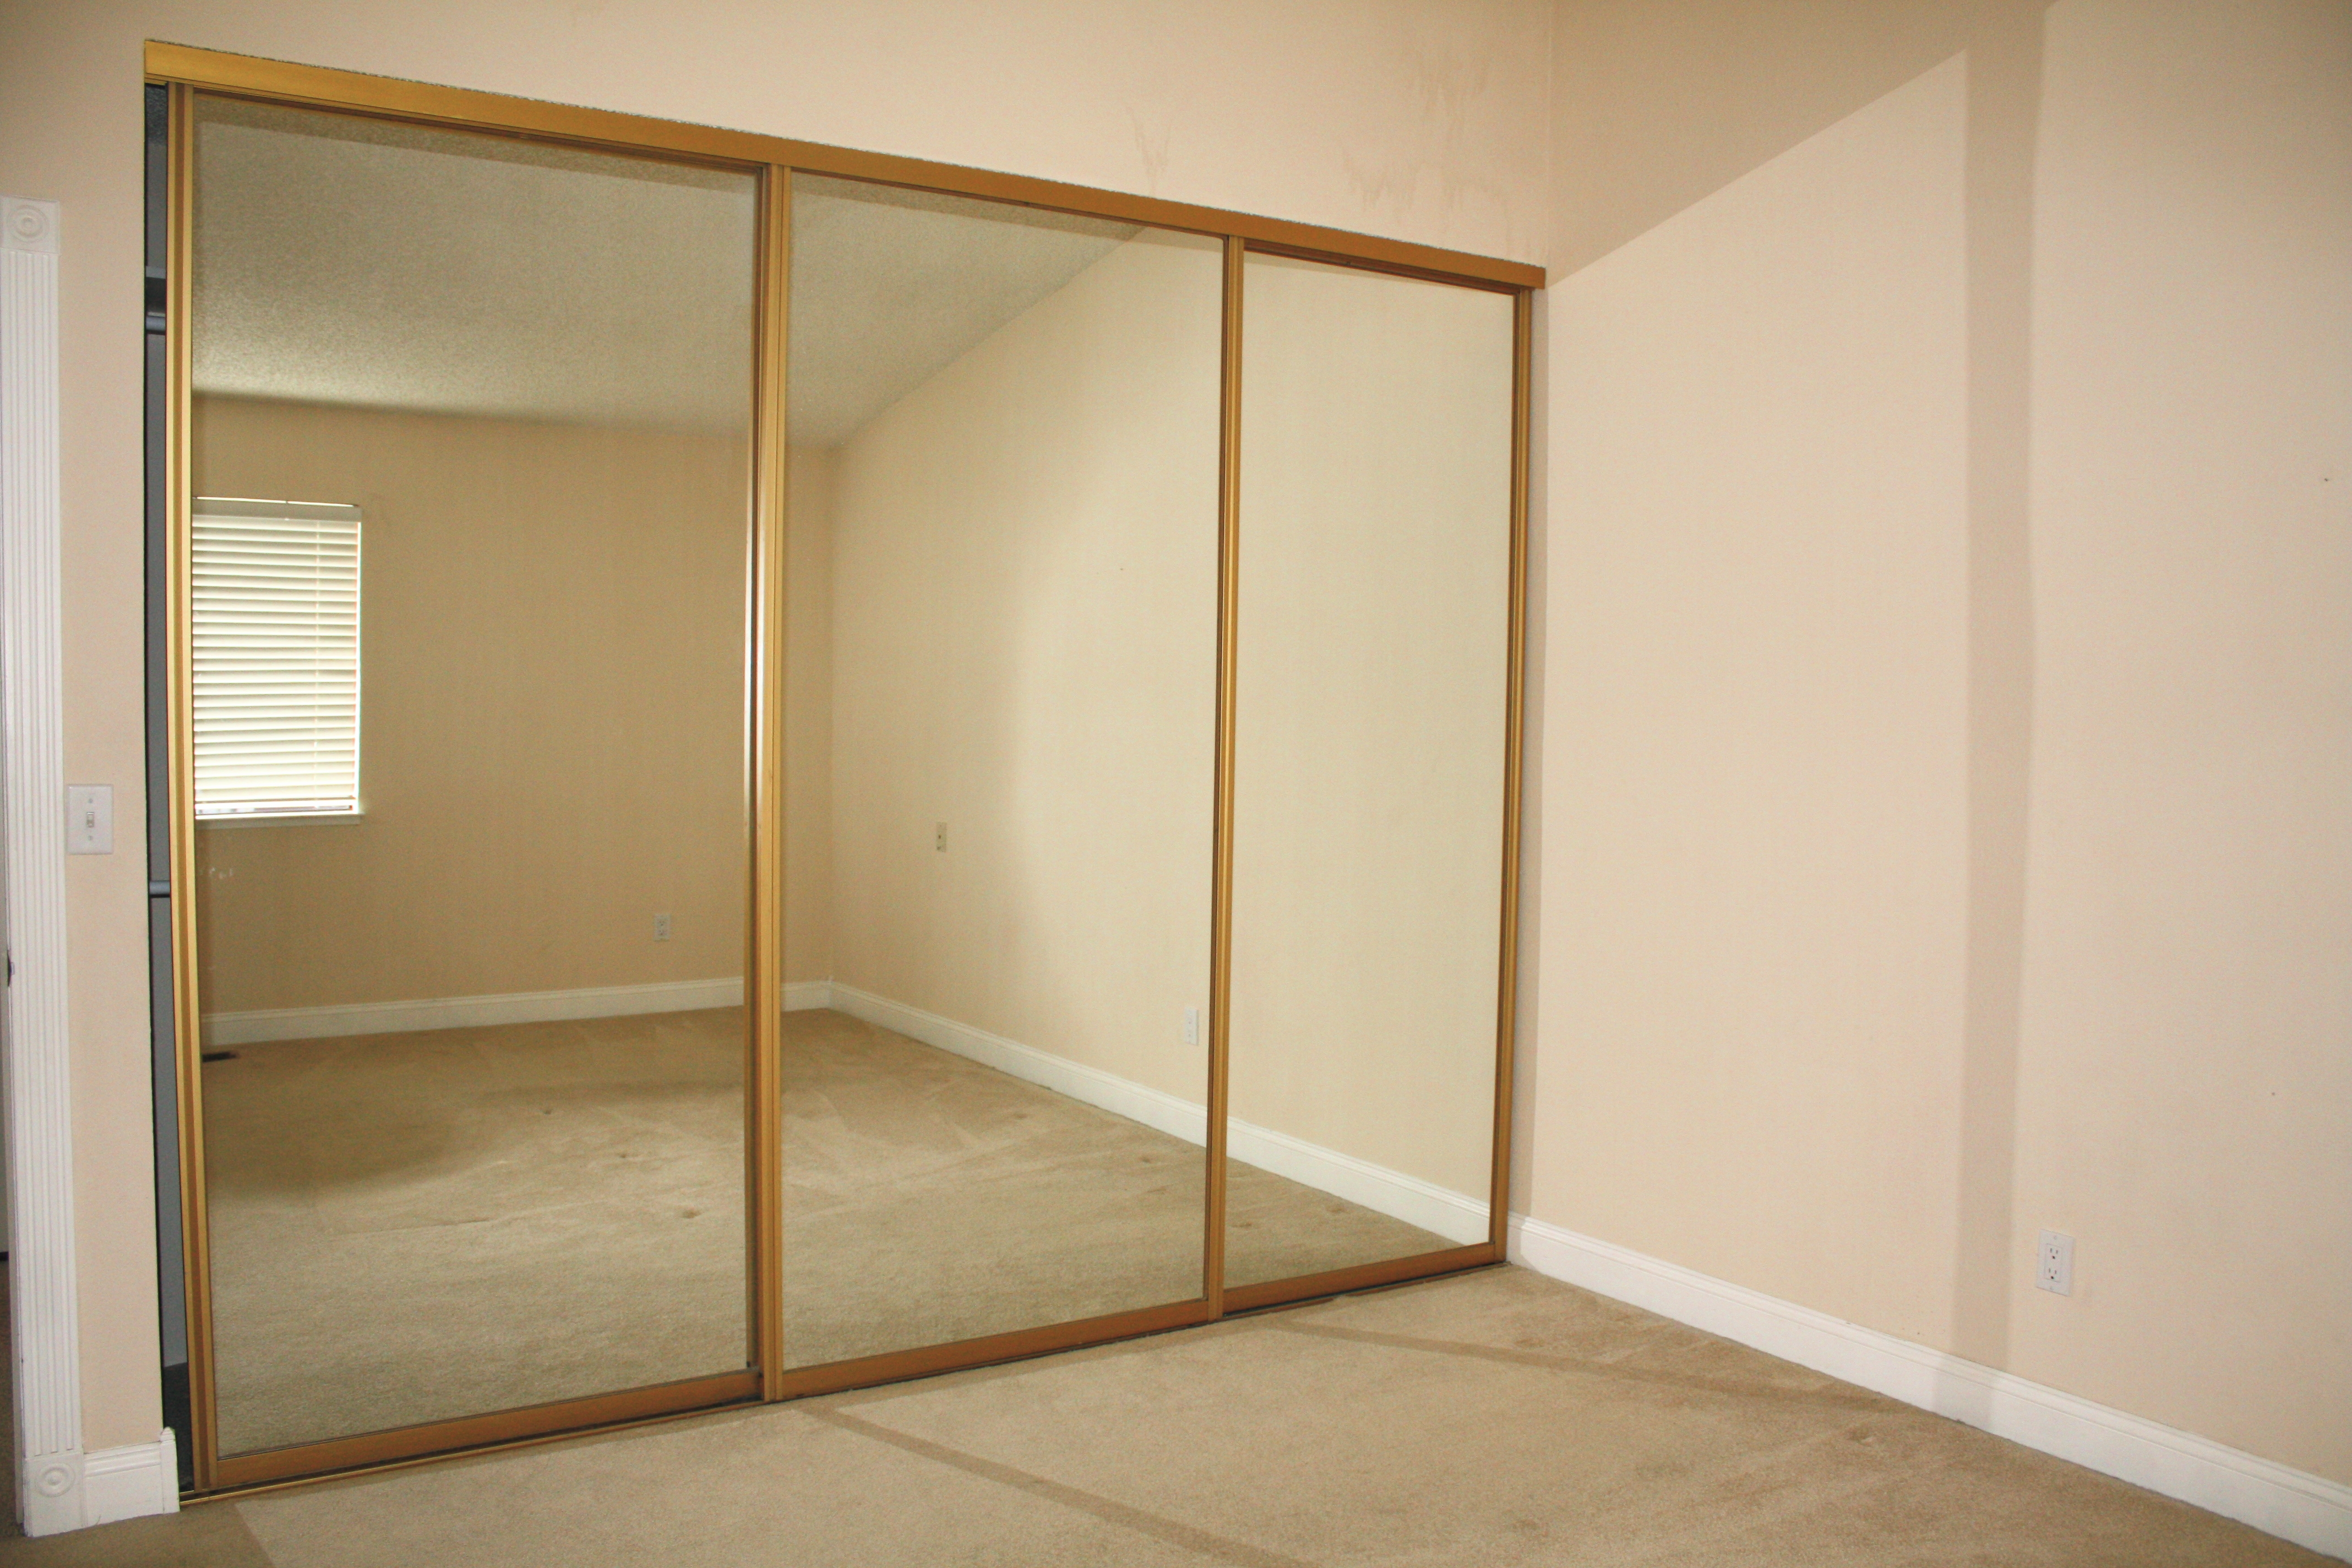 3 Panel Sliding Glass Closet Doors